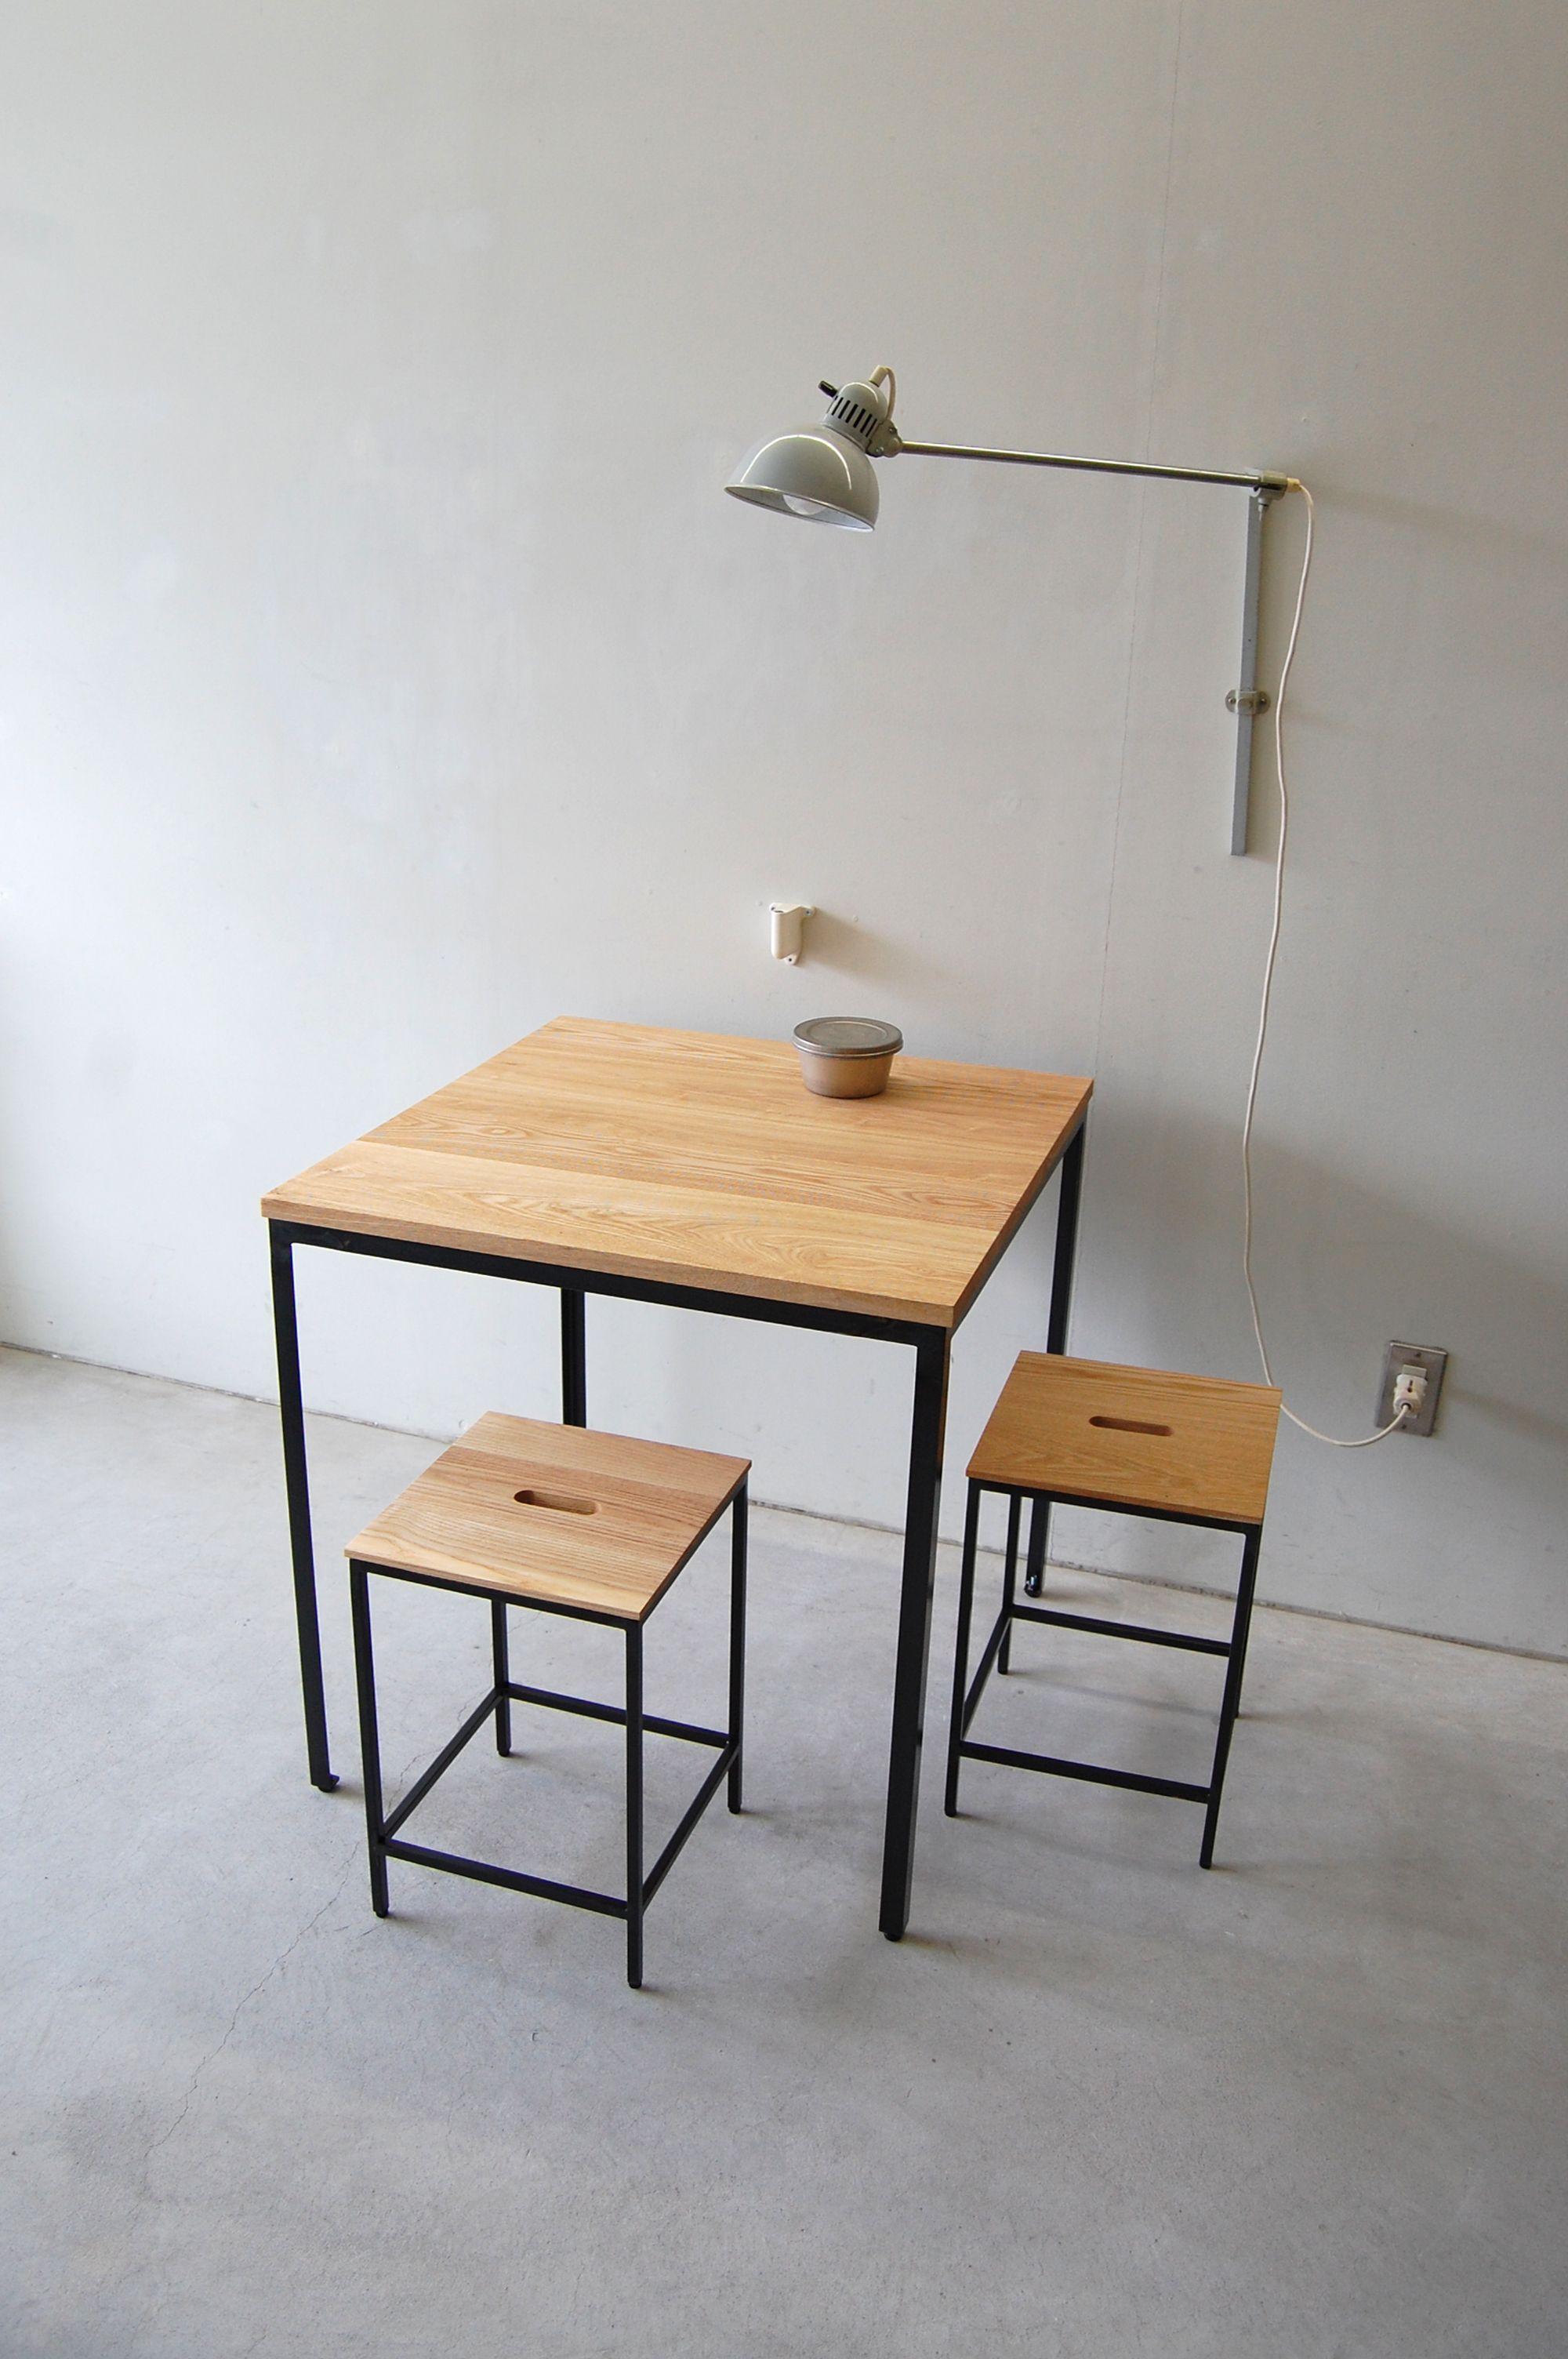 steel chair olx desk pretty atelier square table home ideas pinterest